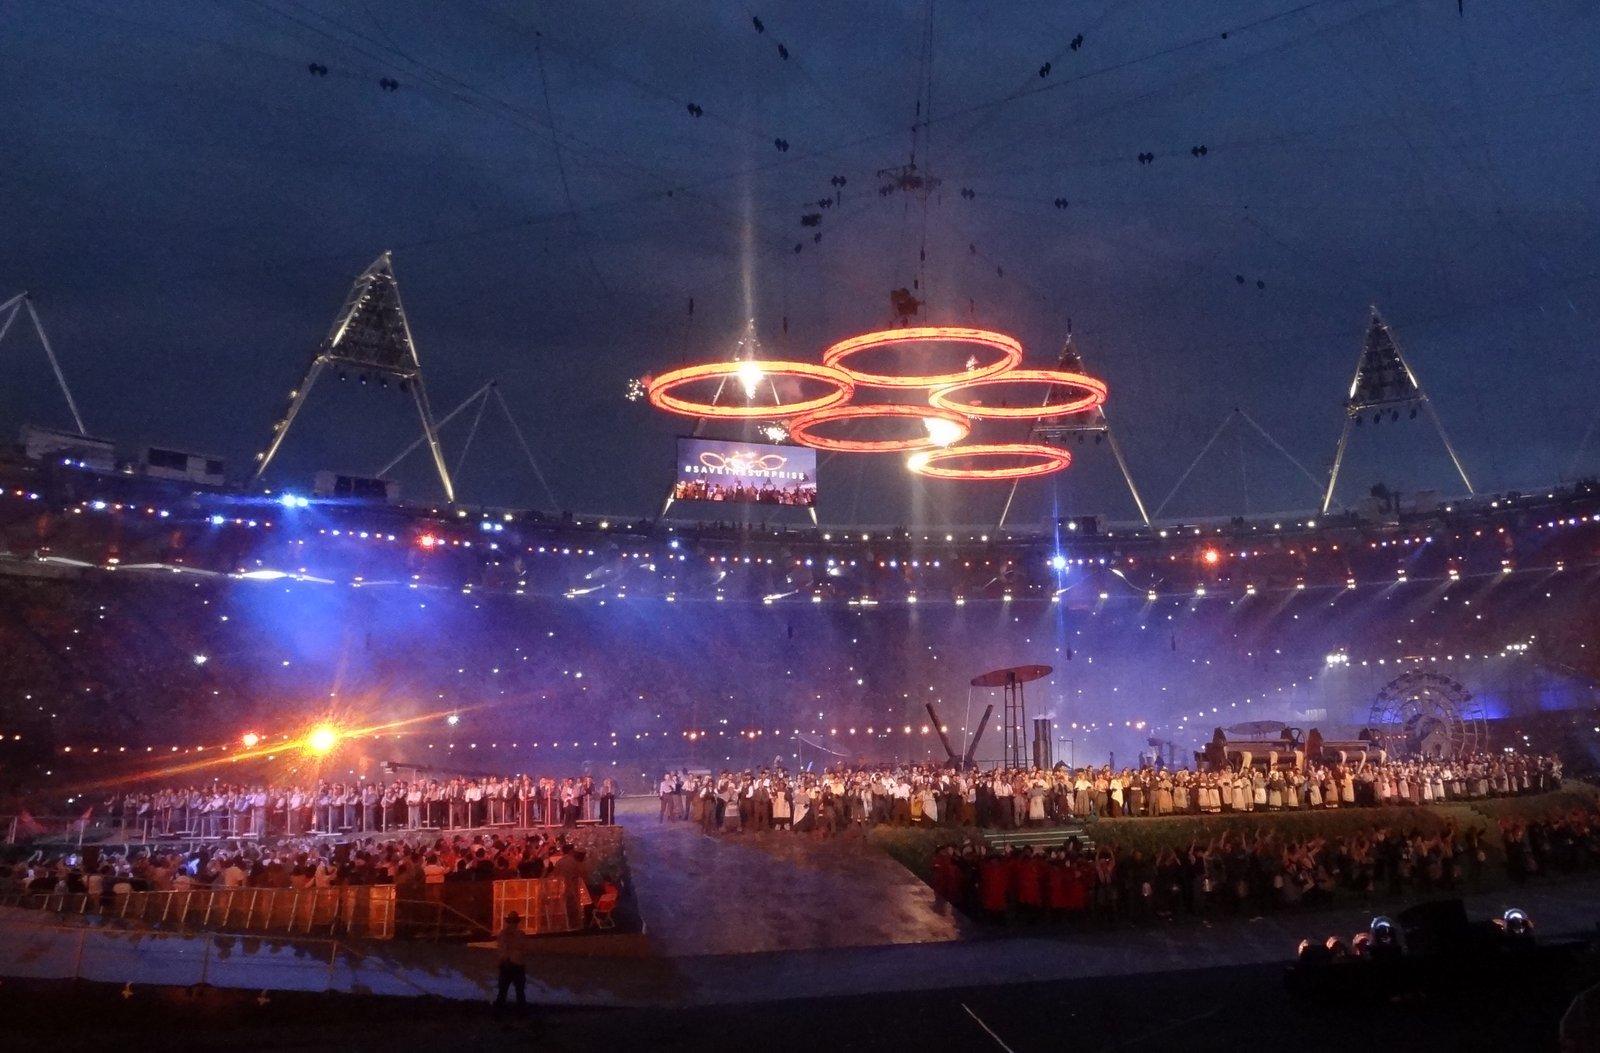 Олимпиада в Лондоне 2012 2018 � �о�о о�з�в� и �а��каз о